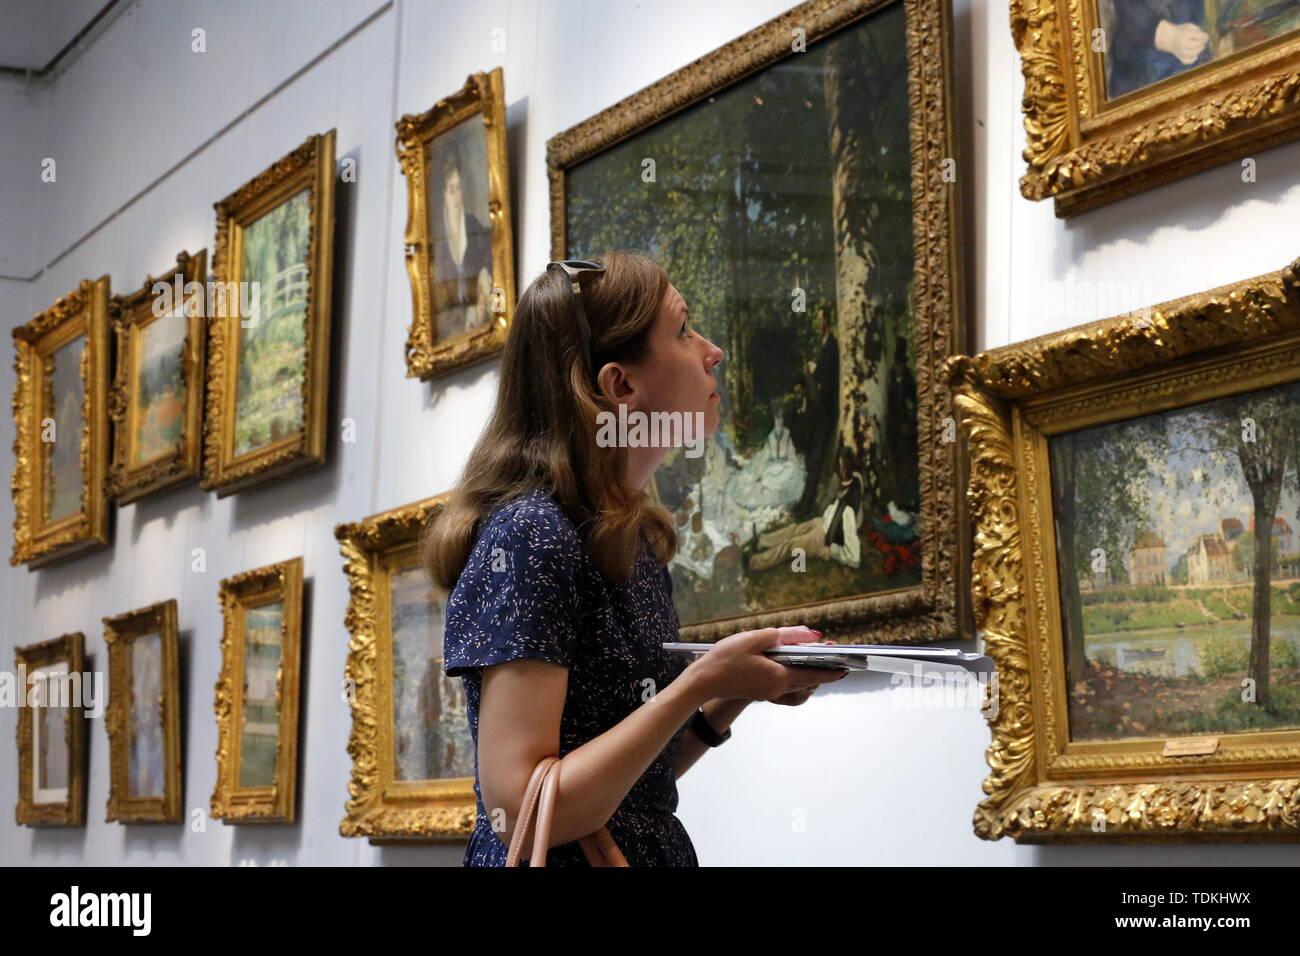 Sergei Shchukin Immagini E Fotos Stock Alamy